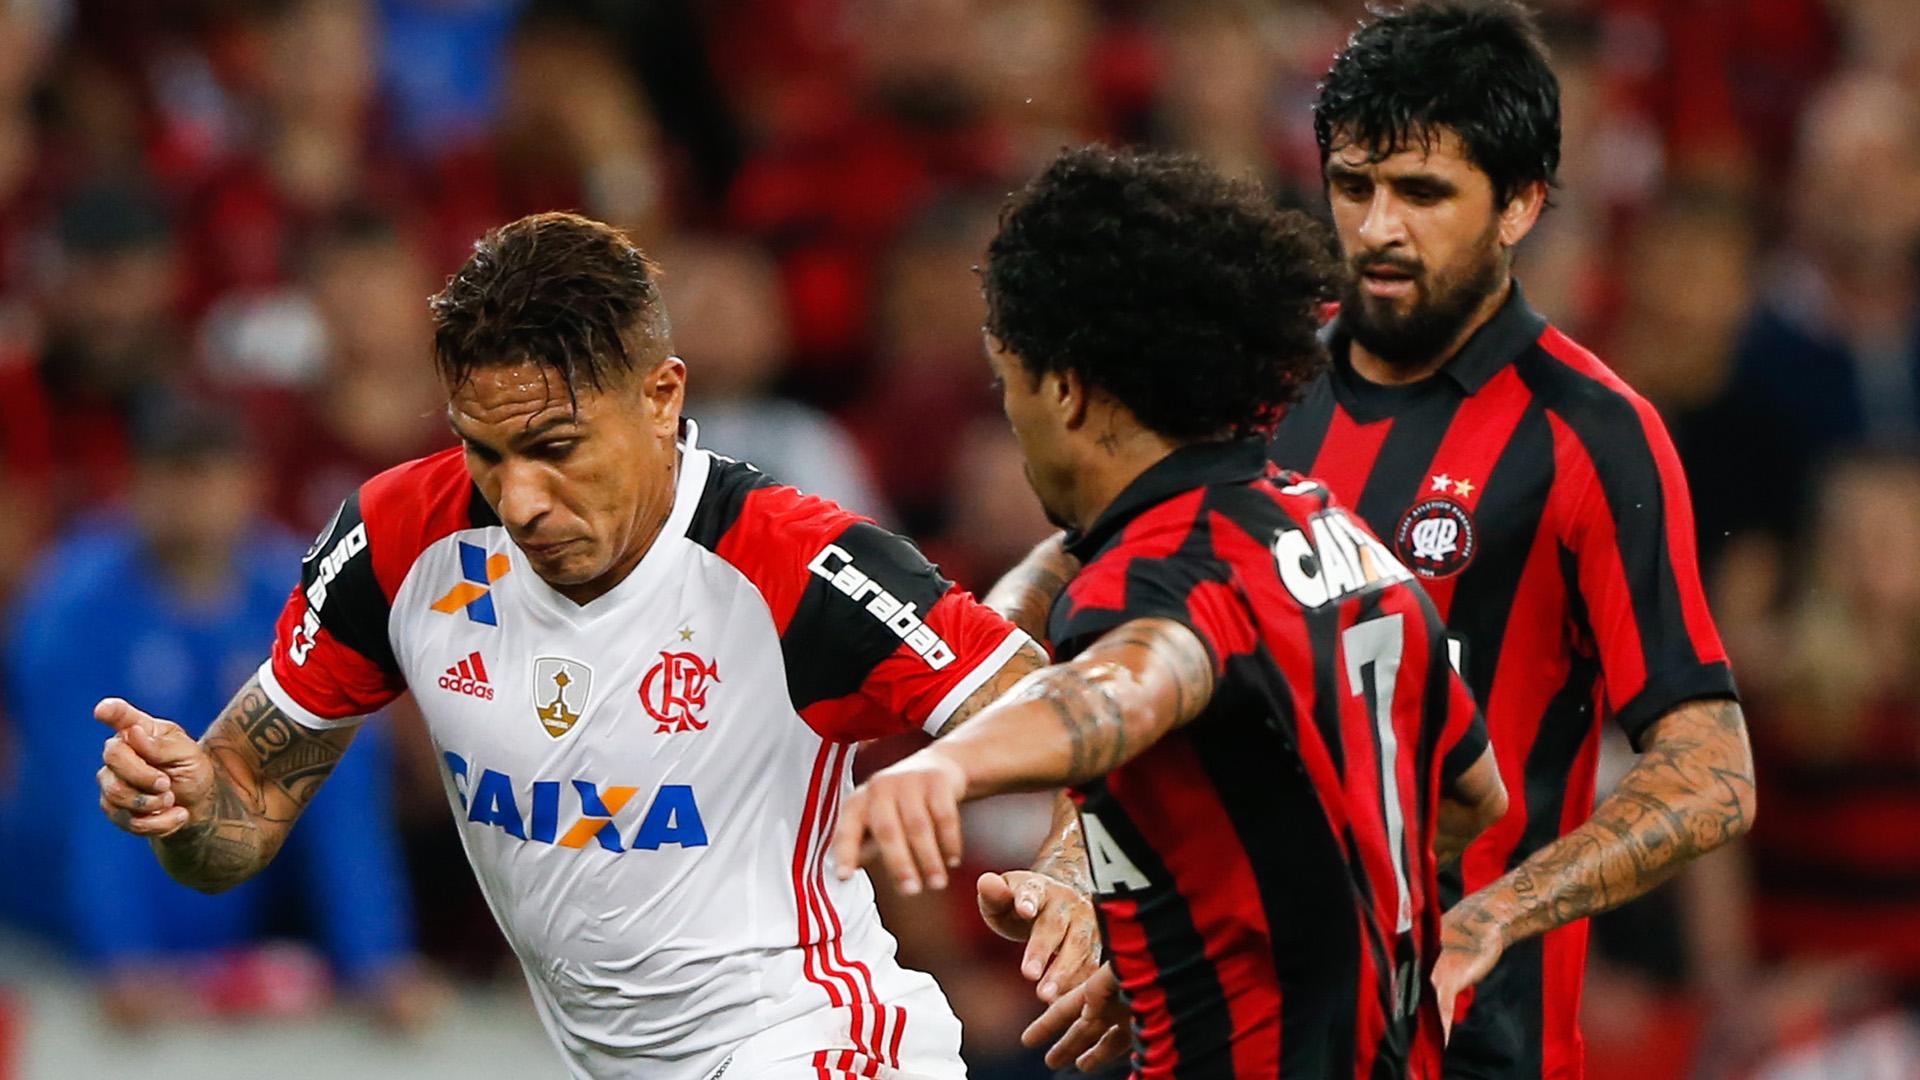 Lucho Gonzalez Guerrero Atletico-PR Flamengo Libertadores 26042017